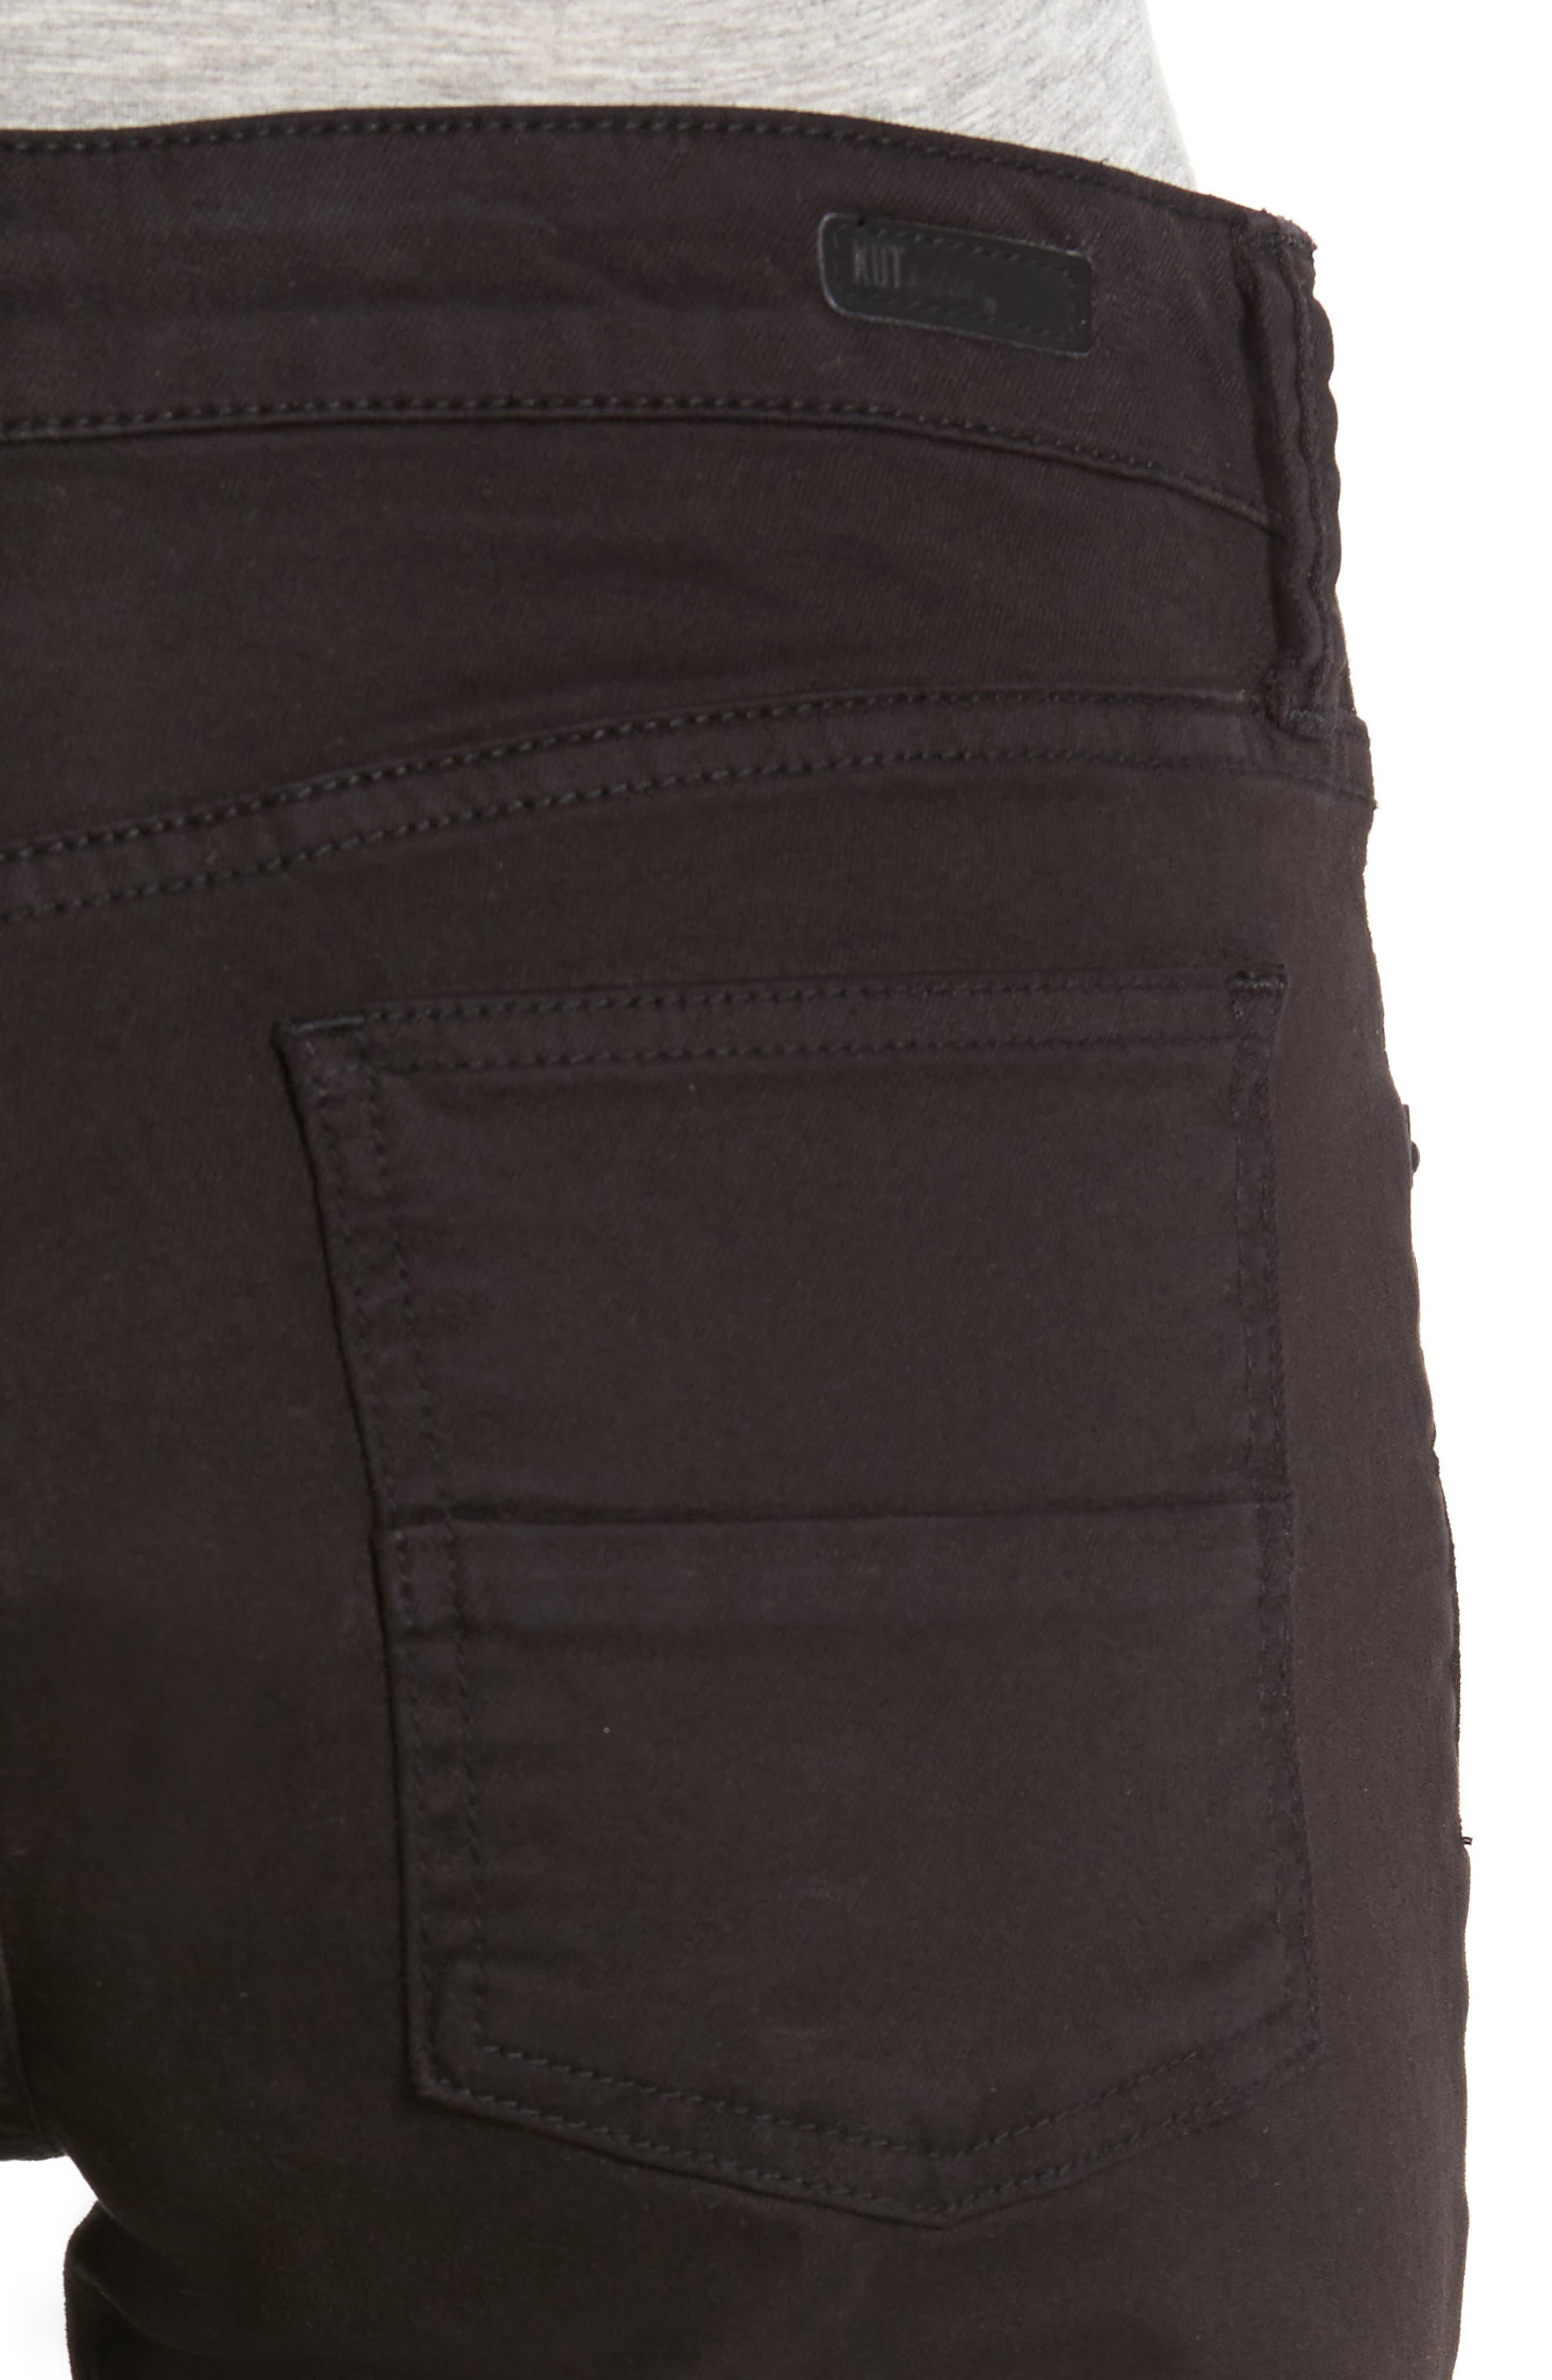 'Natalie' Twill Bermuda Shorts,                             Alternate thumbnail 5, color,                             001